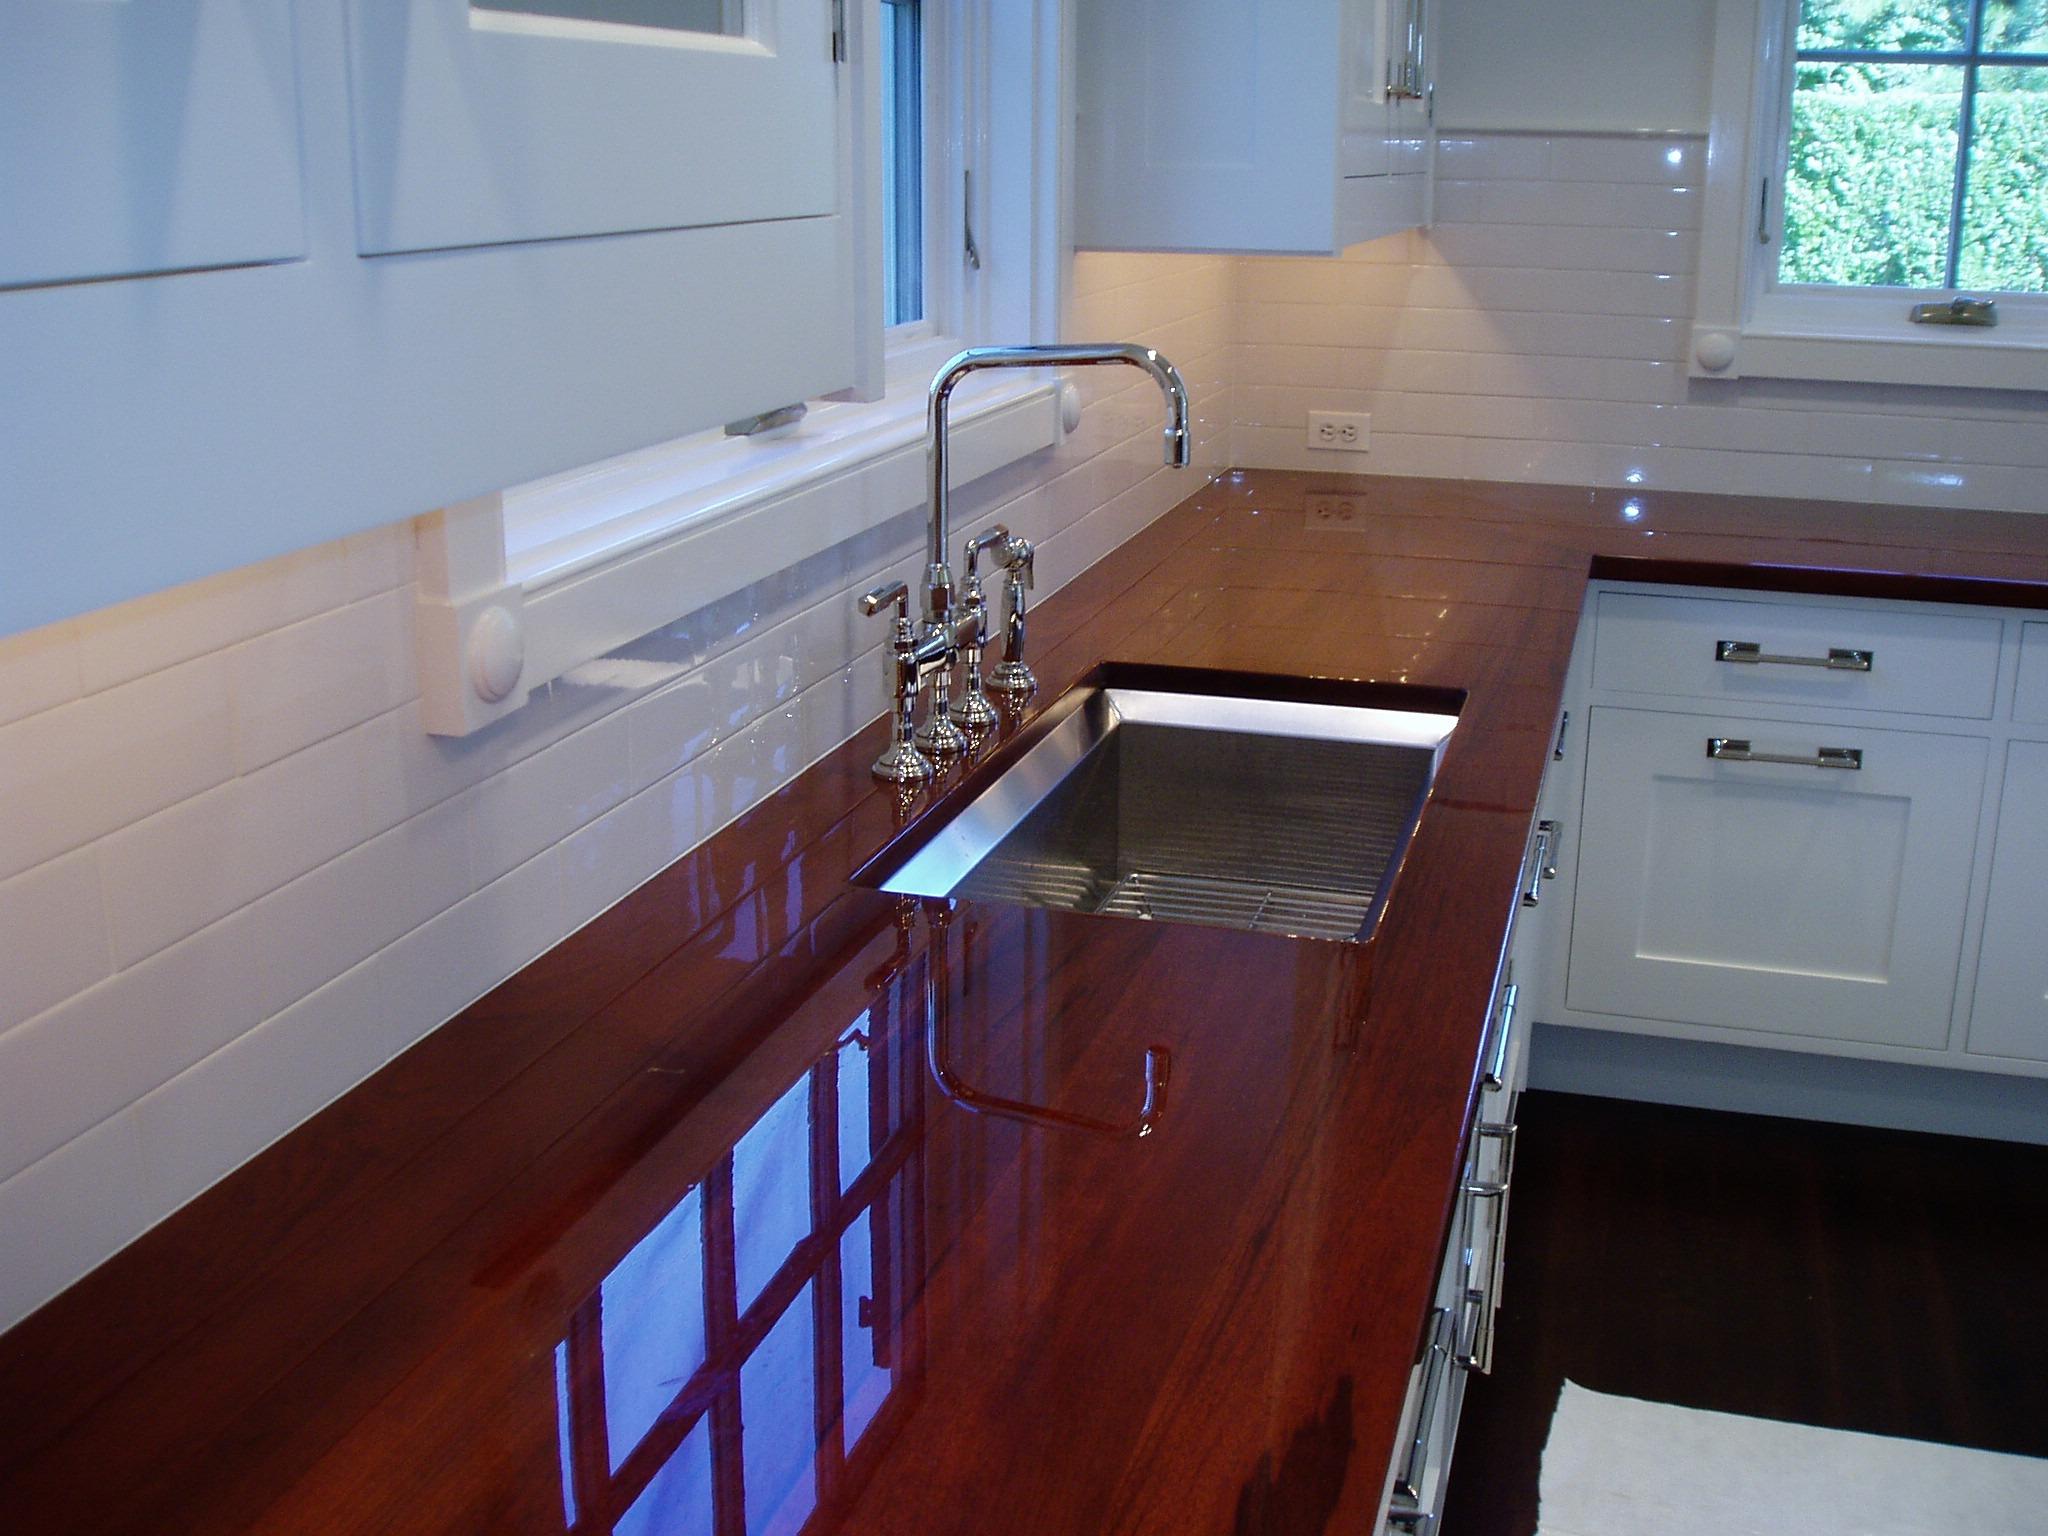 countertop gallery kitchen countertop material OLYMPUS DIGITAL CAMERA Dark Walnut Kitchen